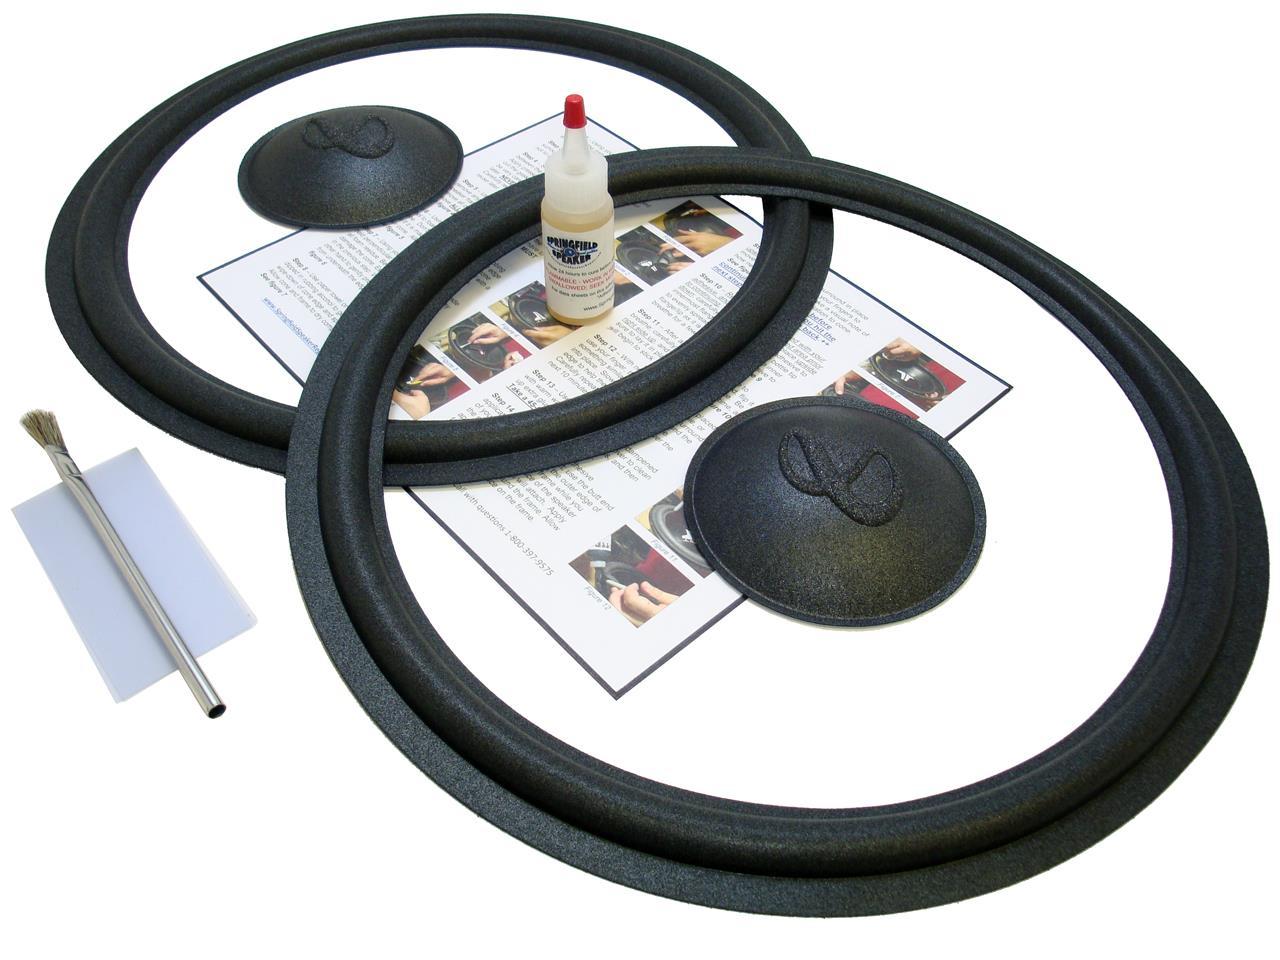 Complete Infinity 15 Quot Sm 152 Speaker Foam Repair Kit W